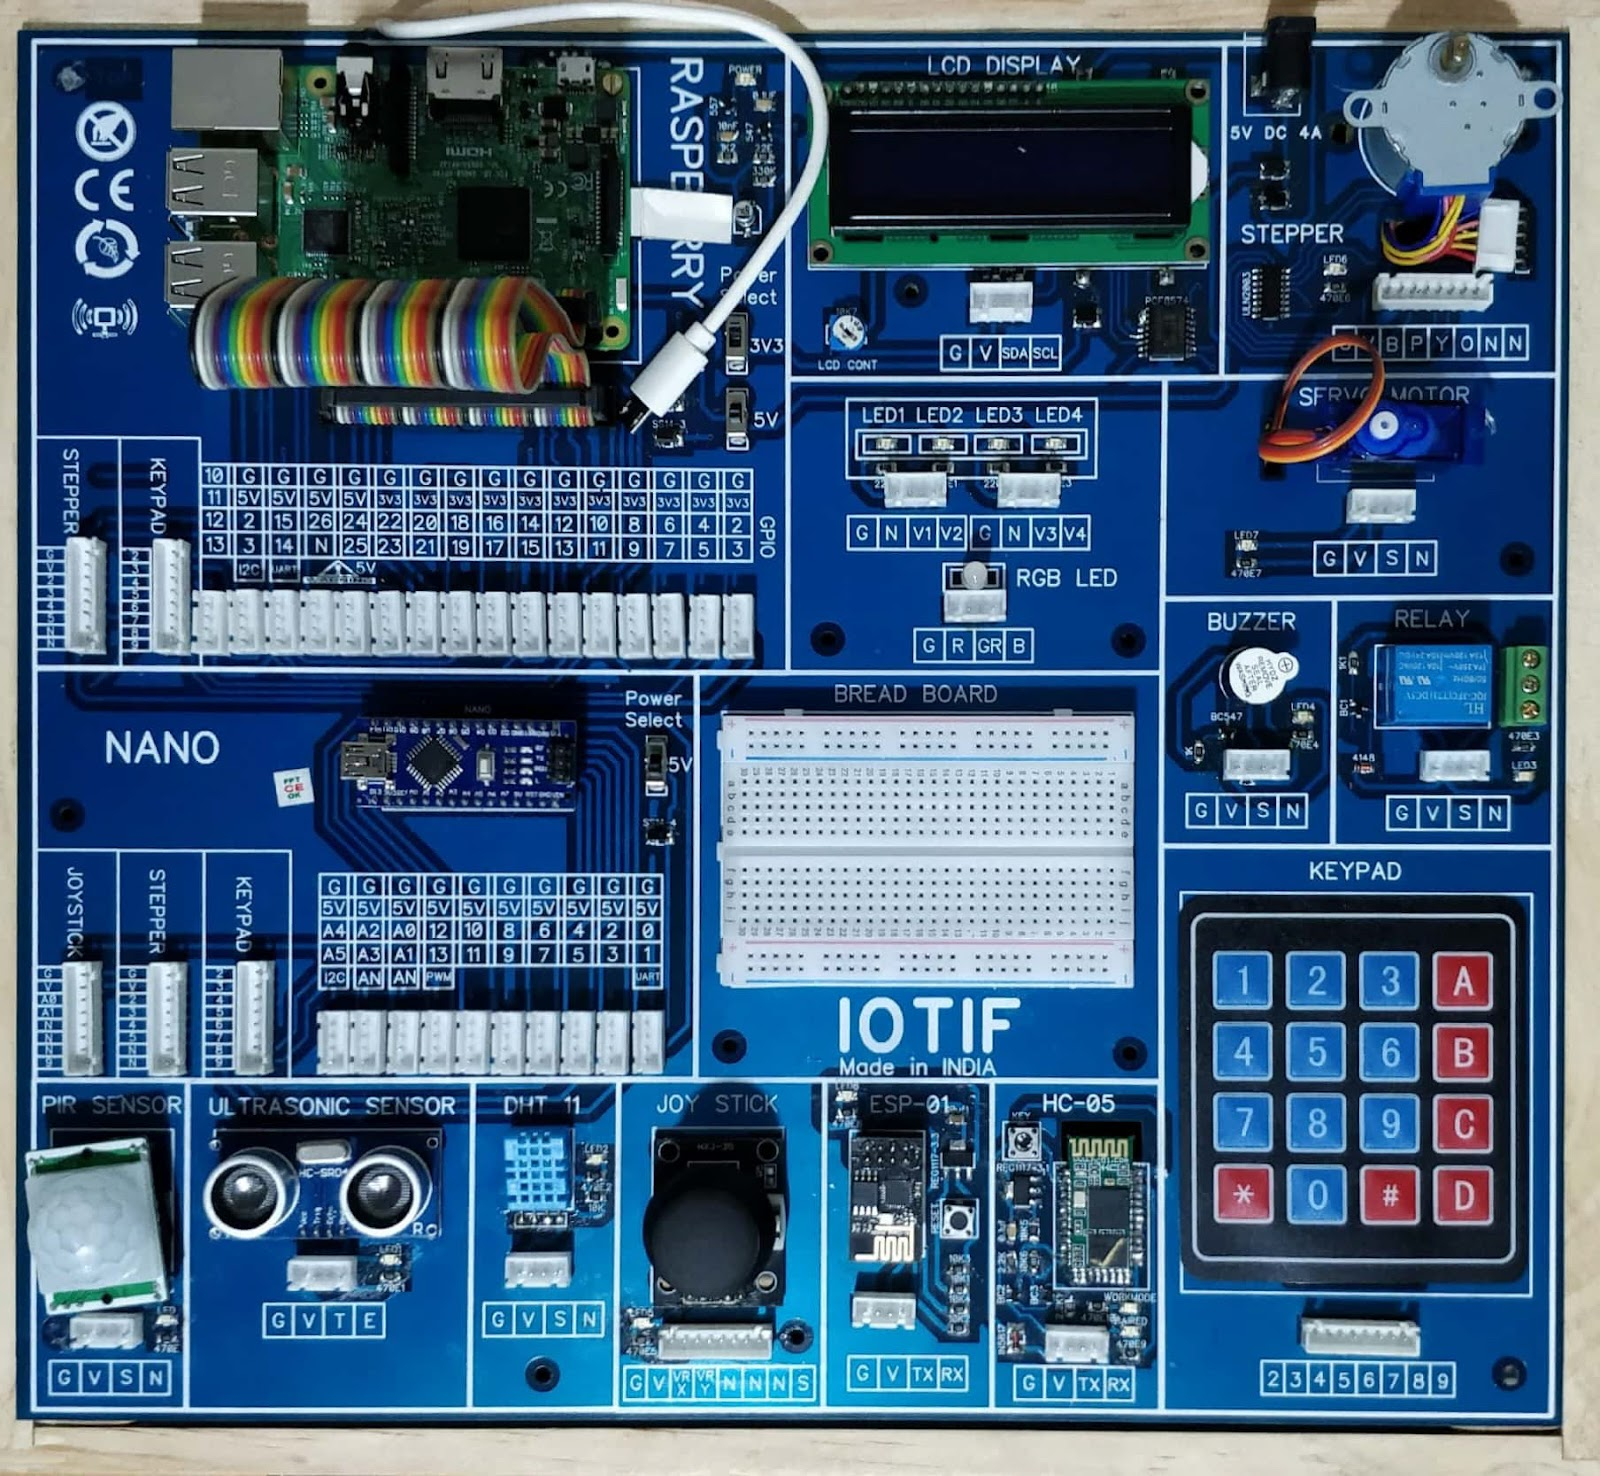 IOTIF Board